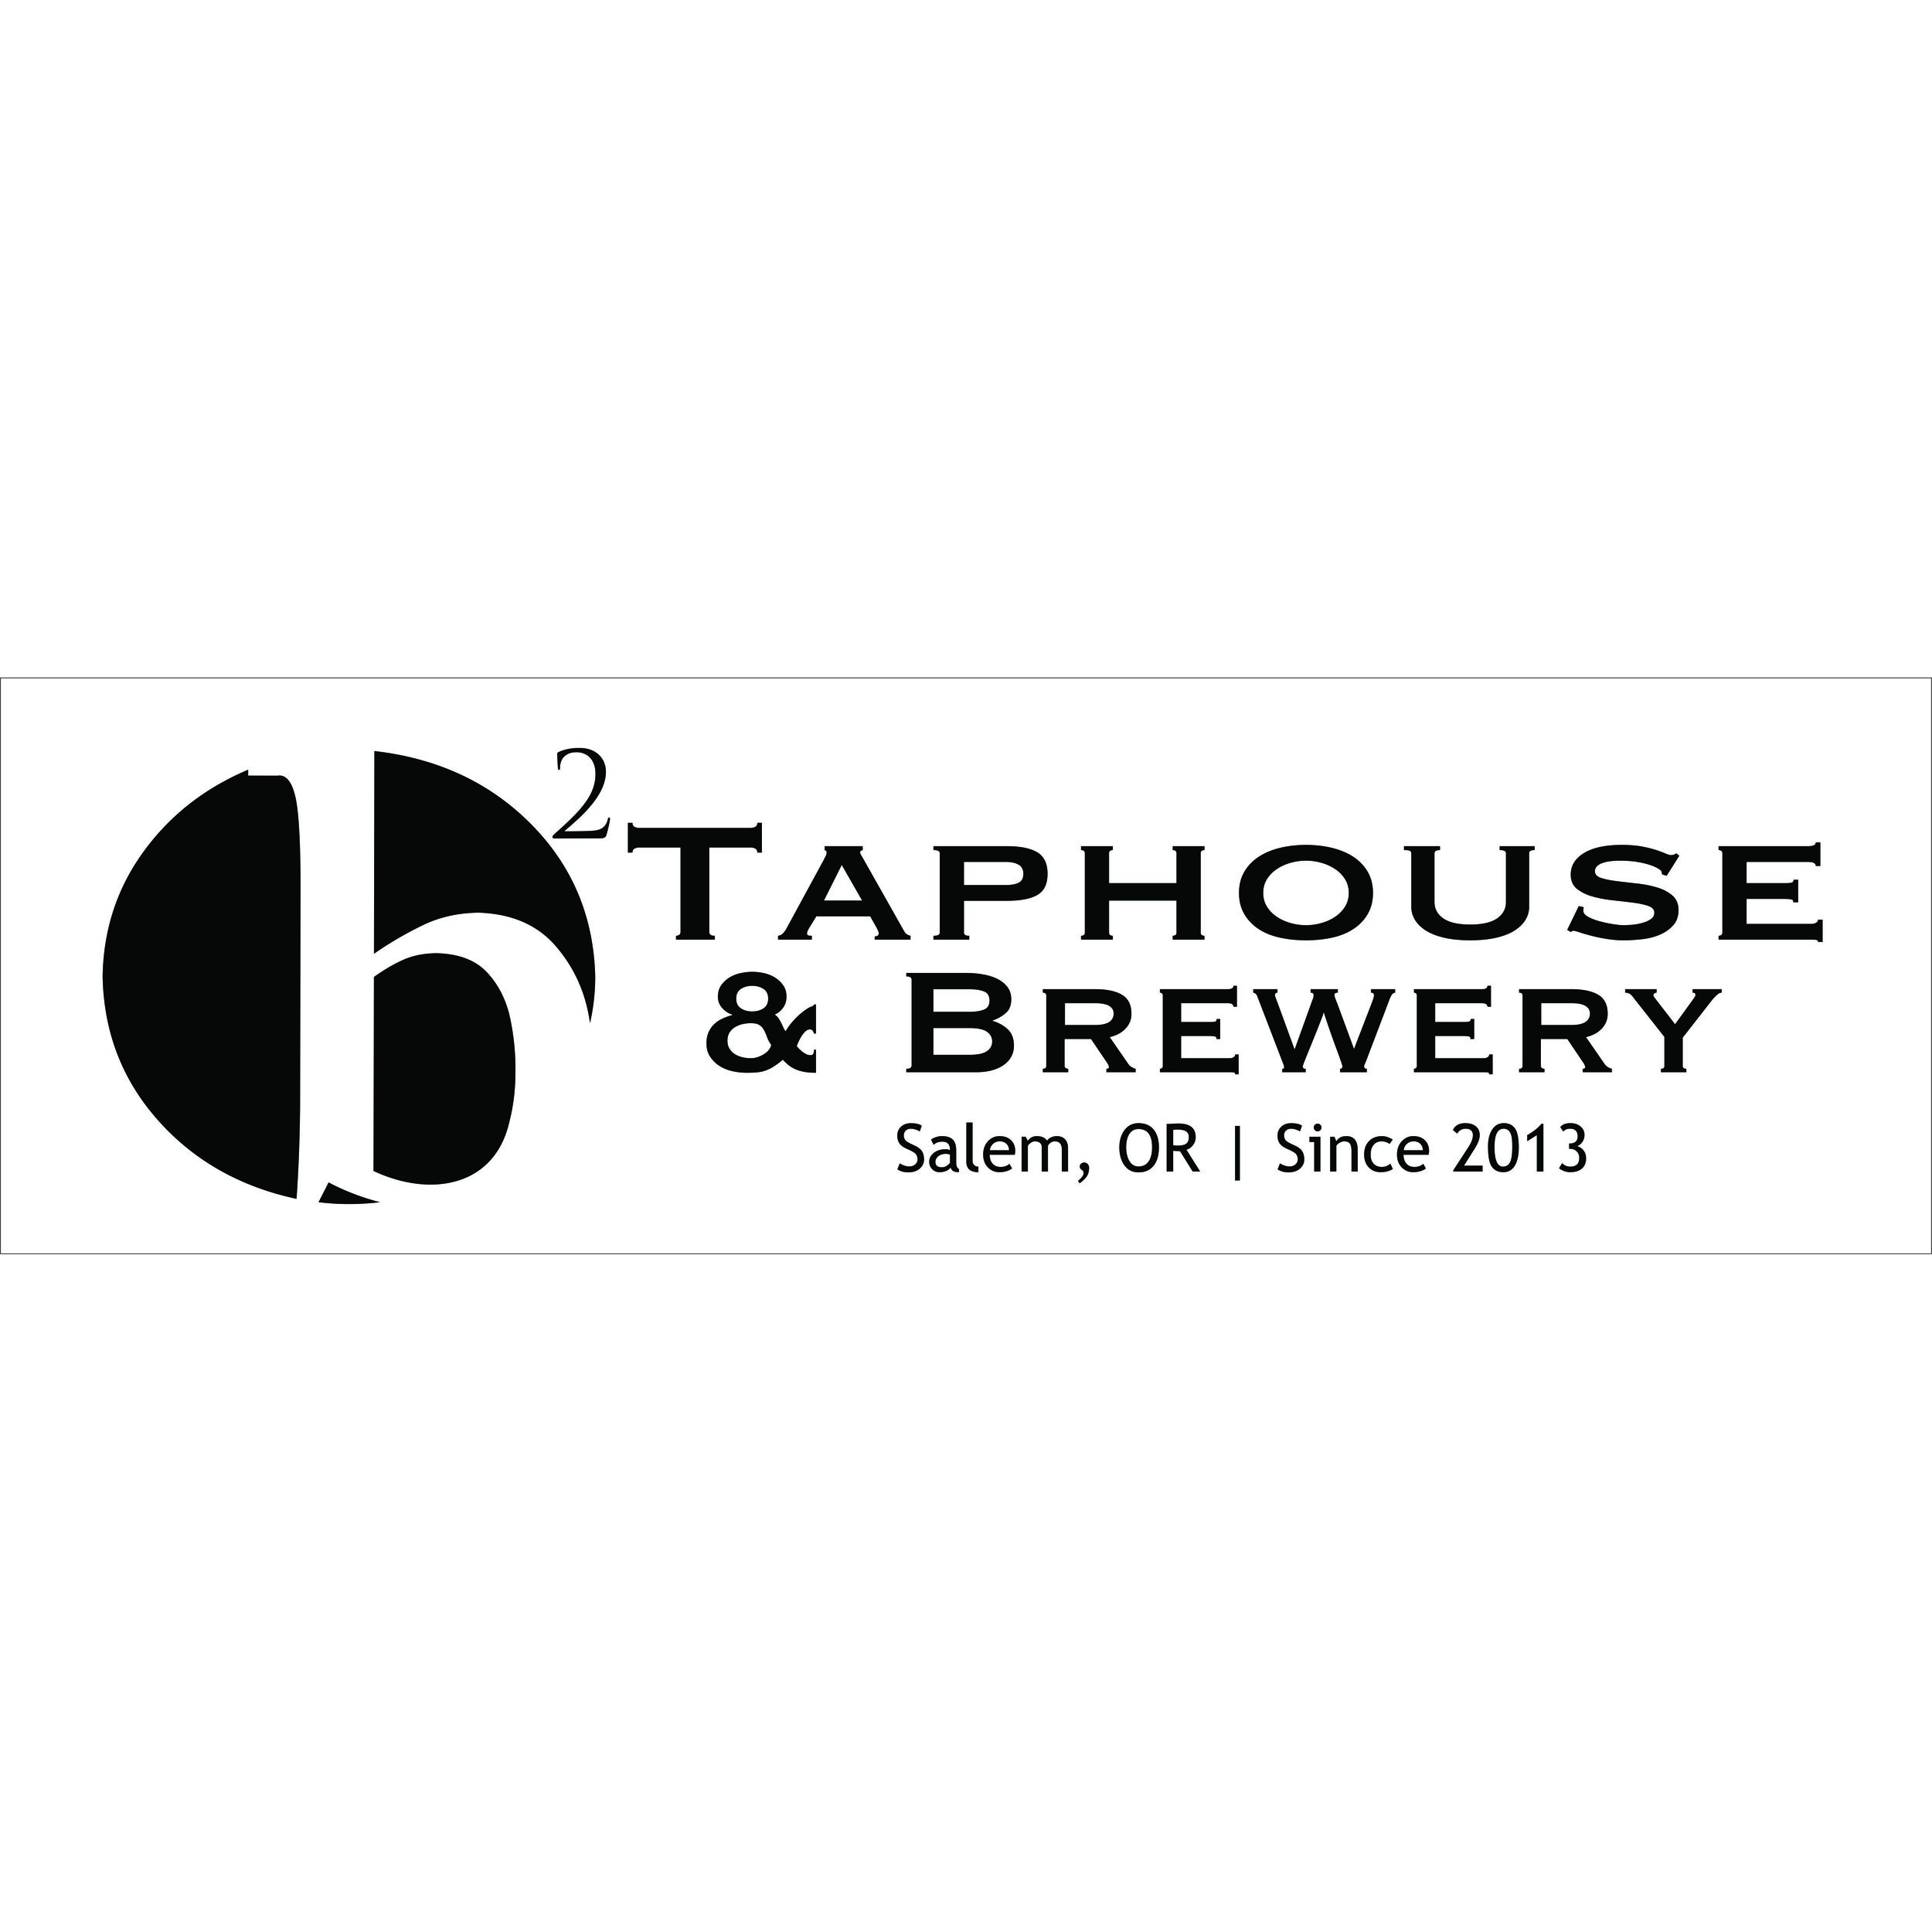 b2 brewery logo square.jpg